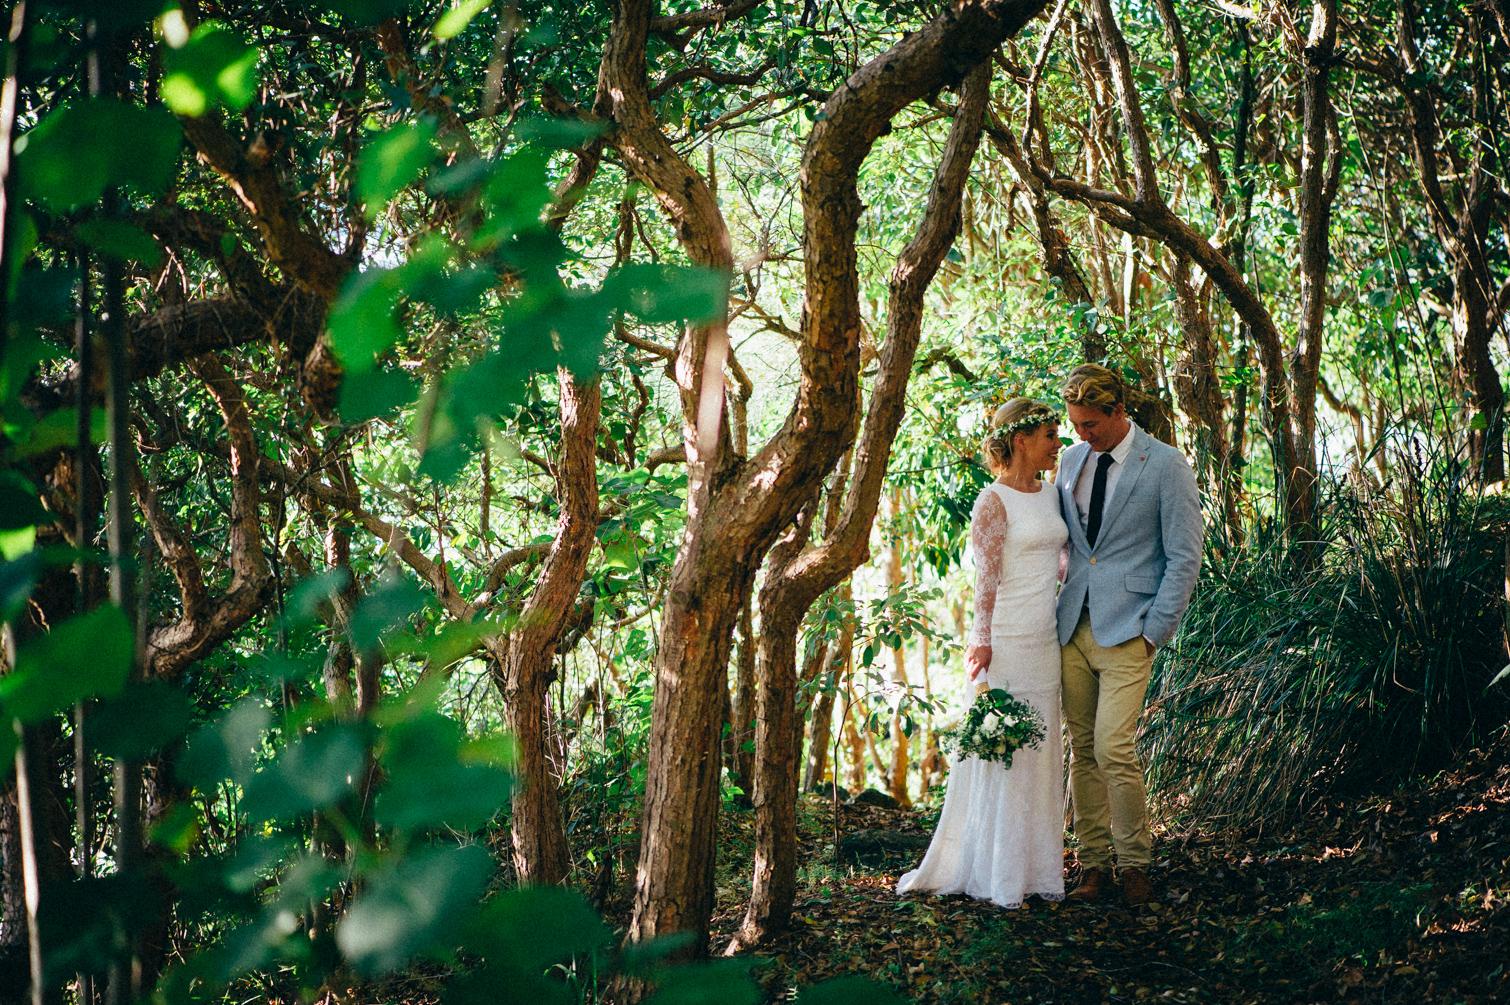 Kirra_Hill-Community_Centre_Wedding_Venue-12.jpg